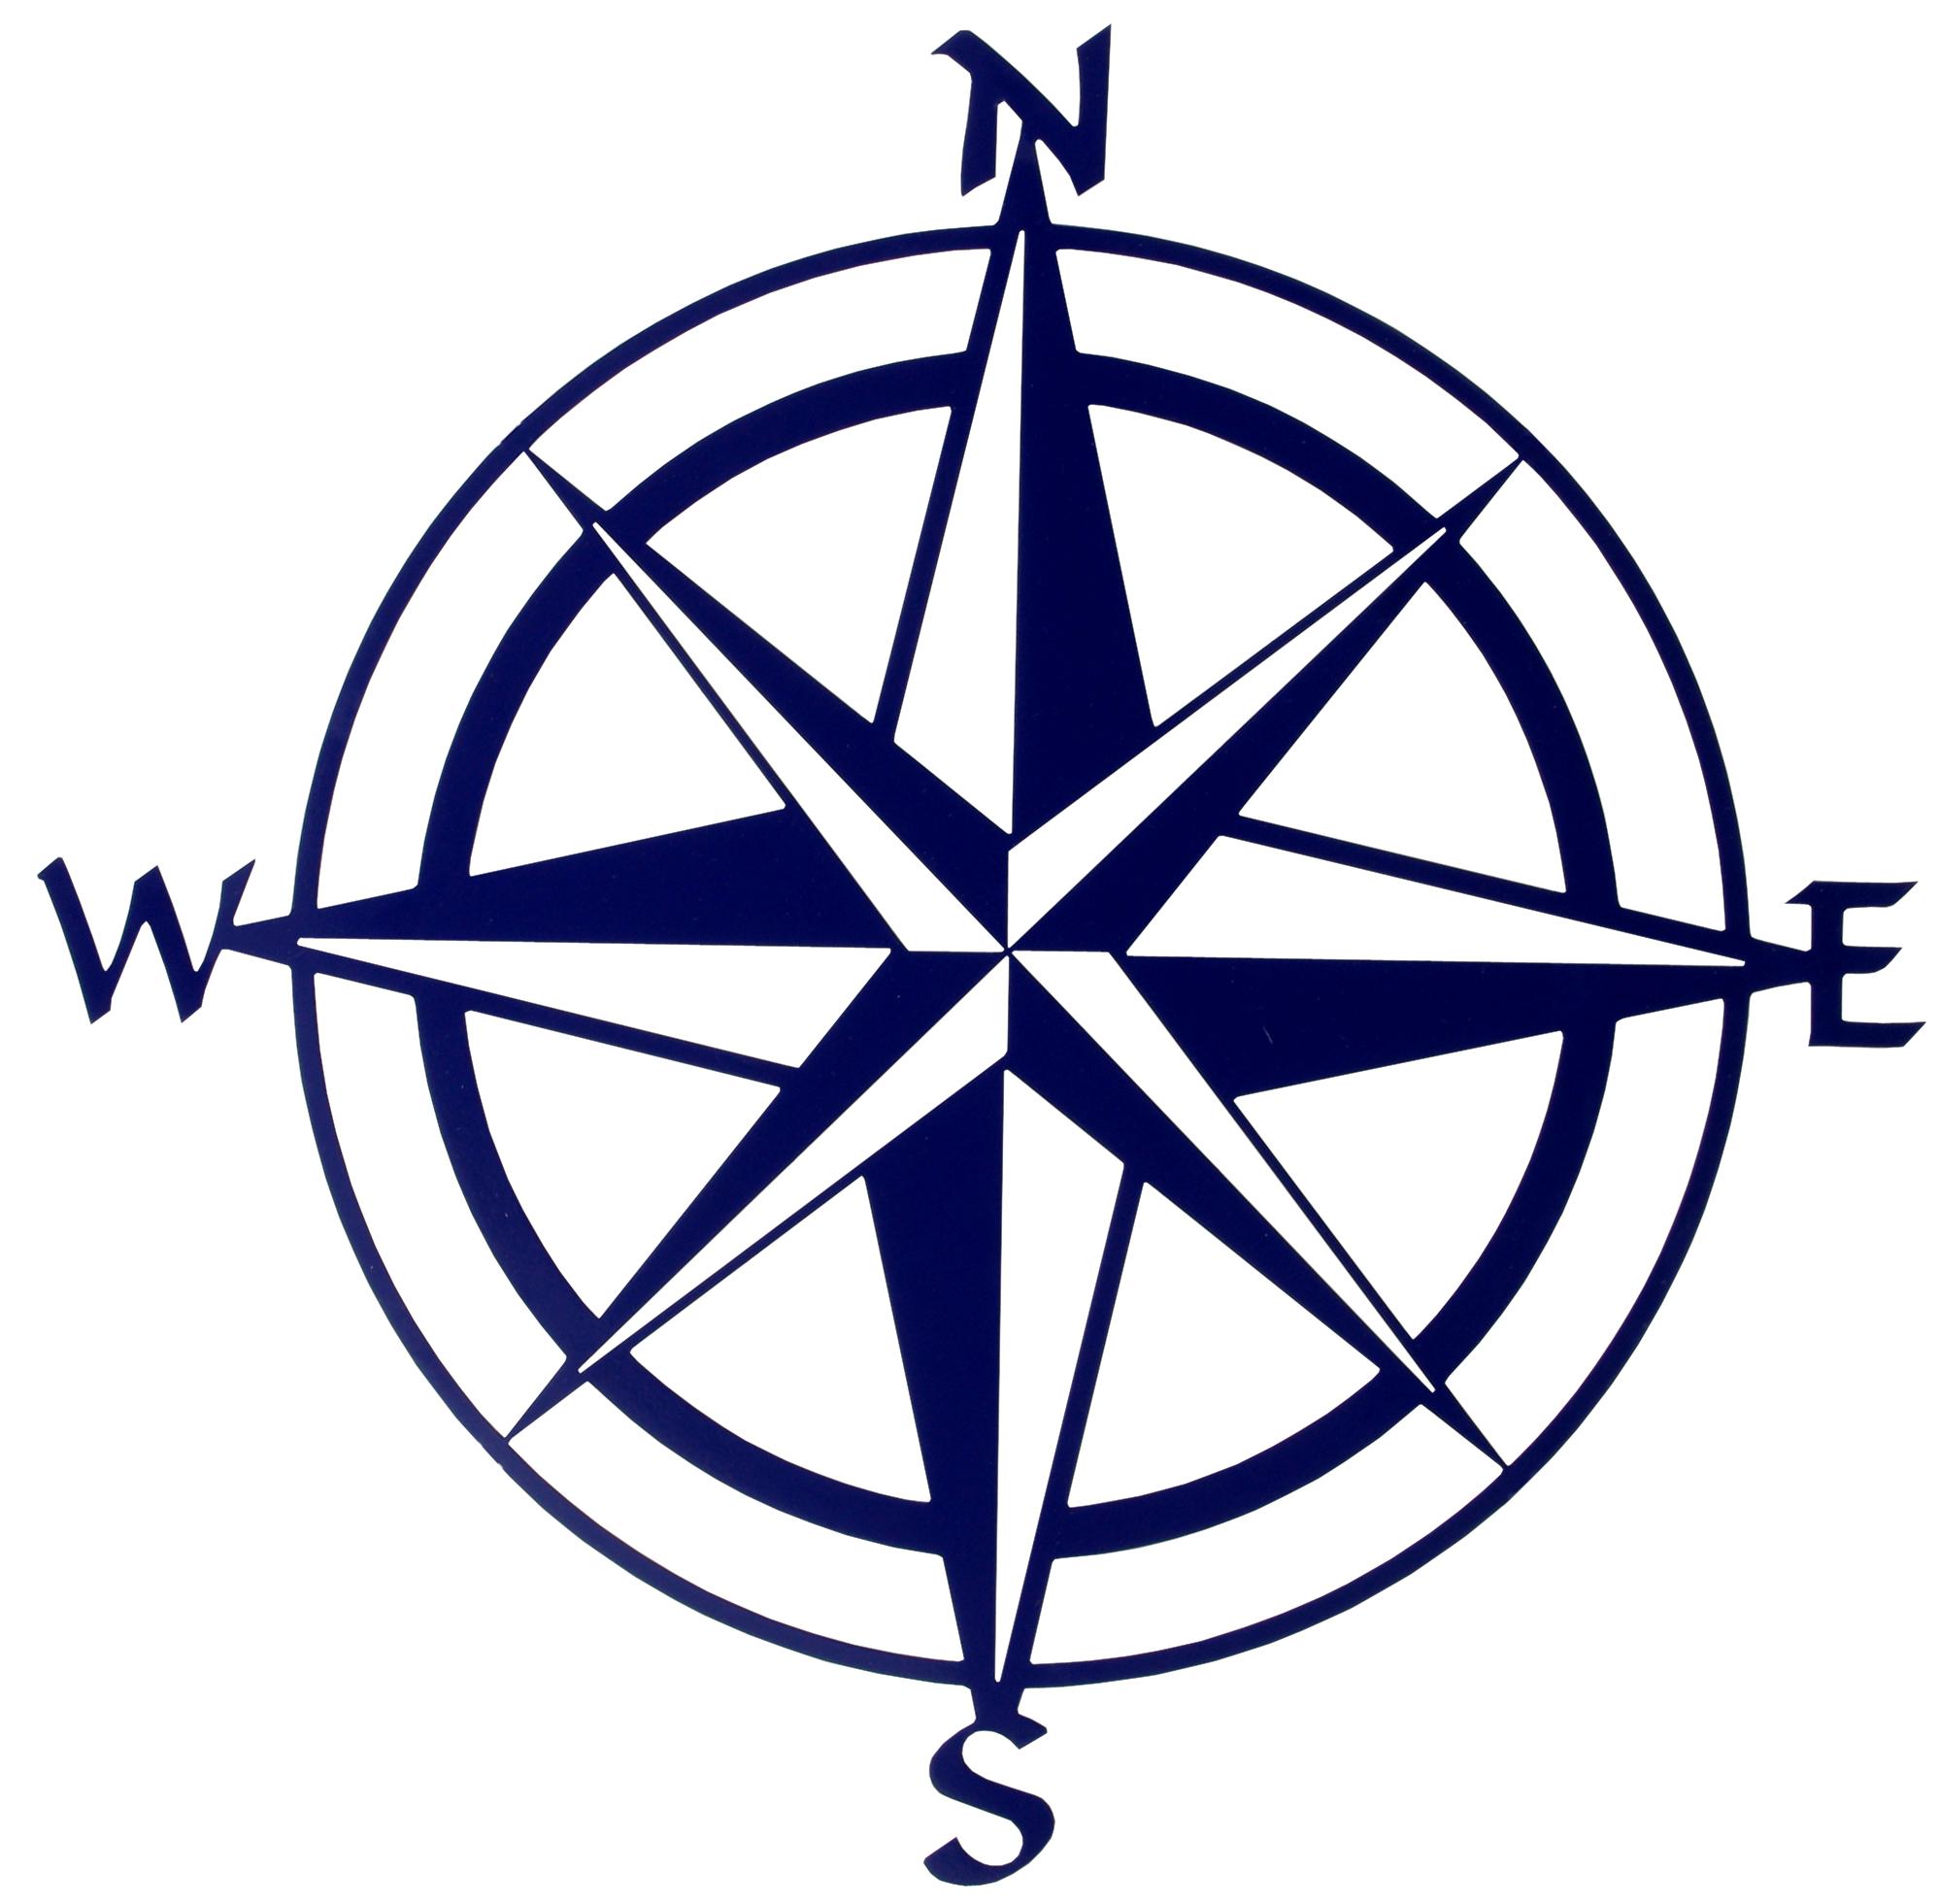 Blank Compass Rose